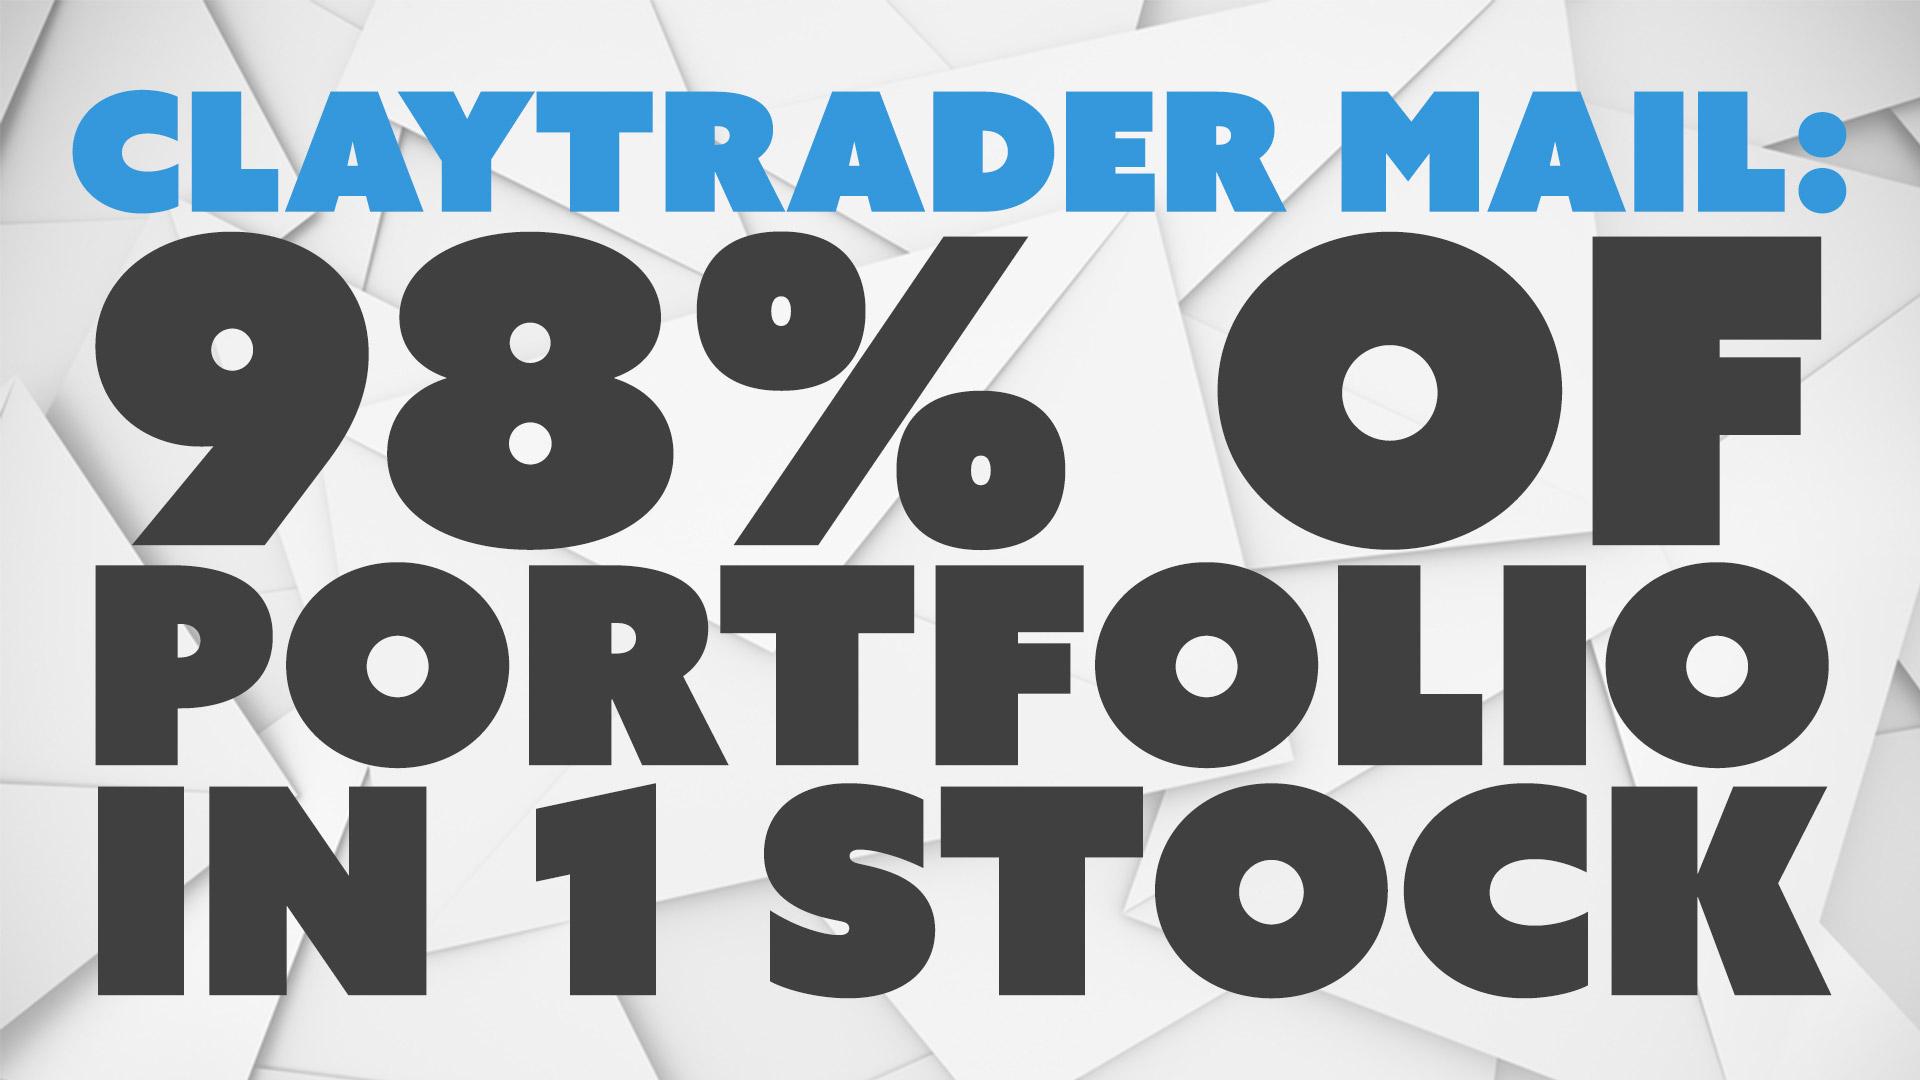 98% of Portfolio in 1 Stock